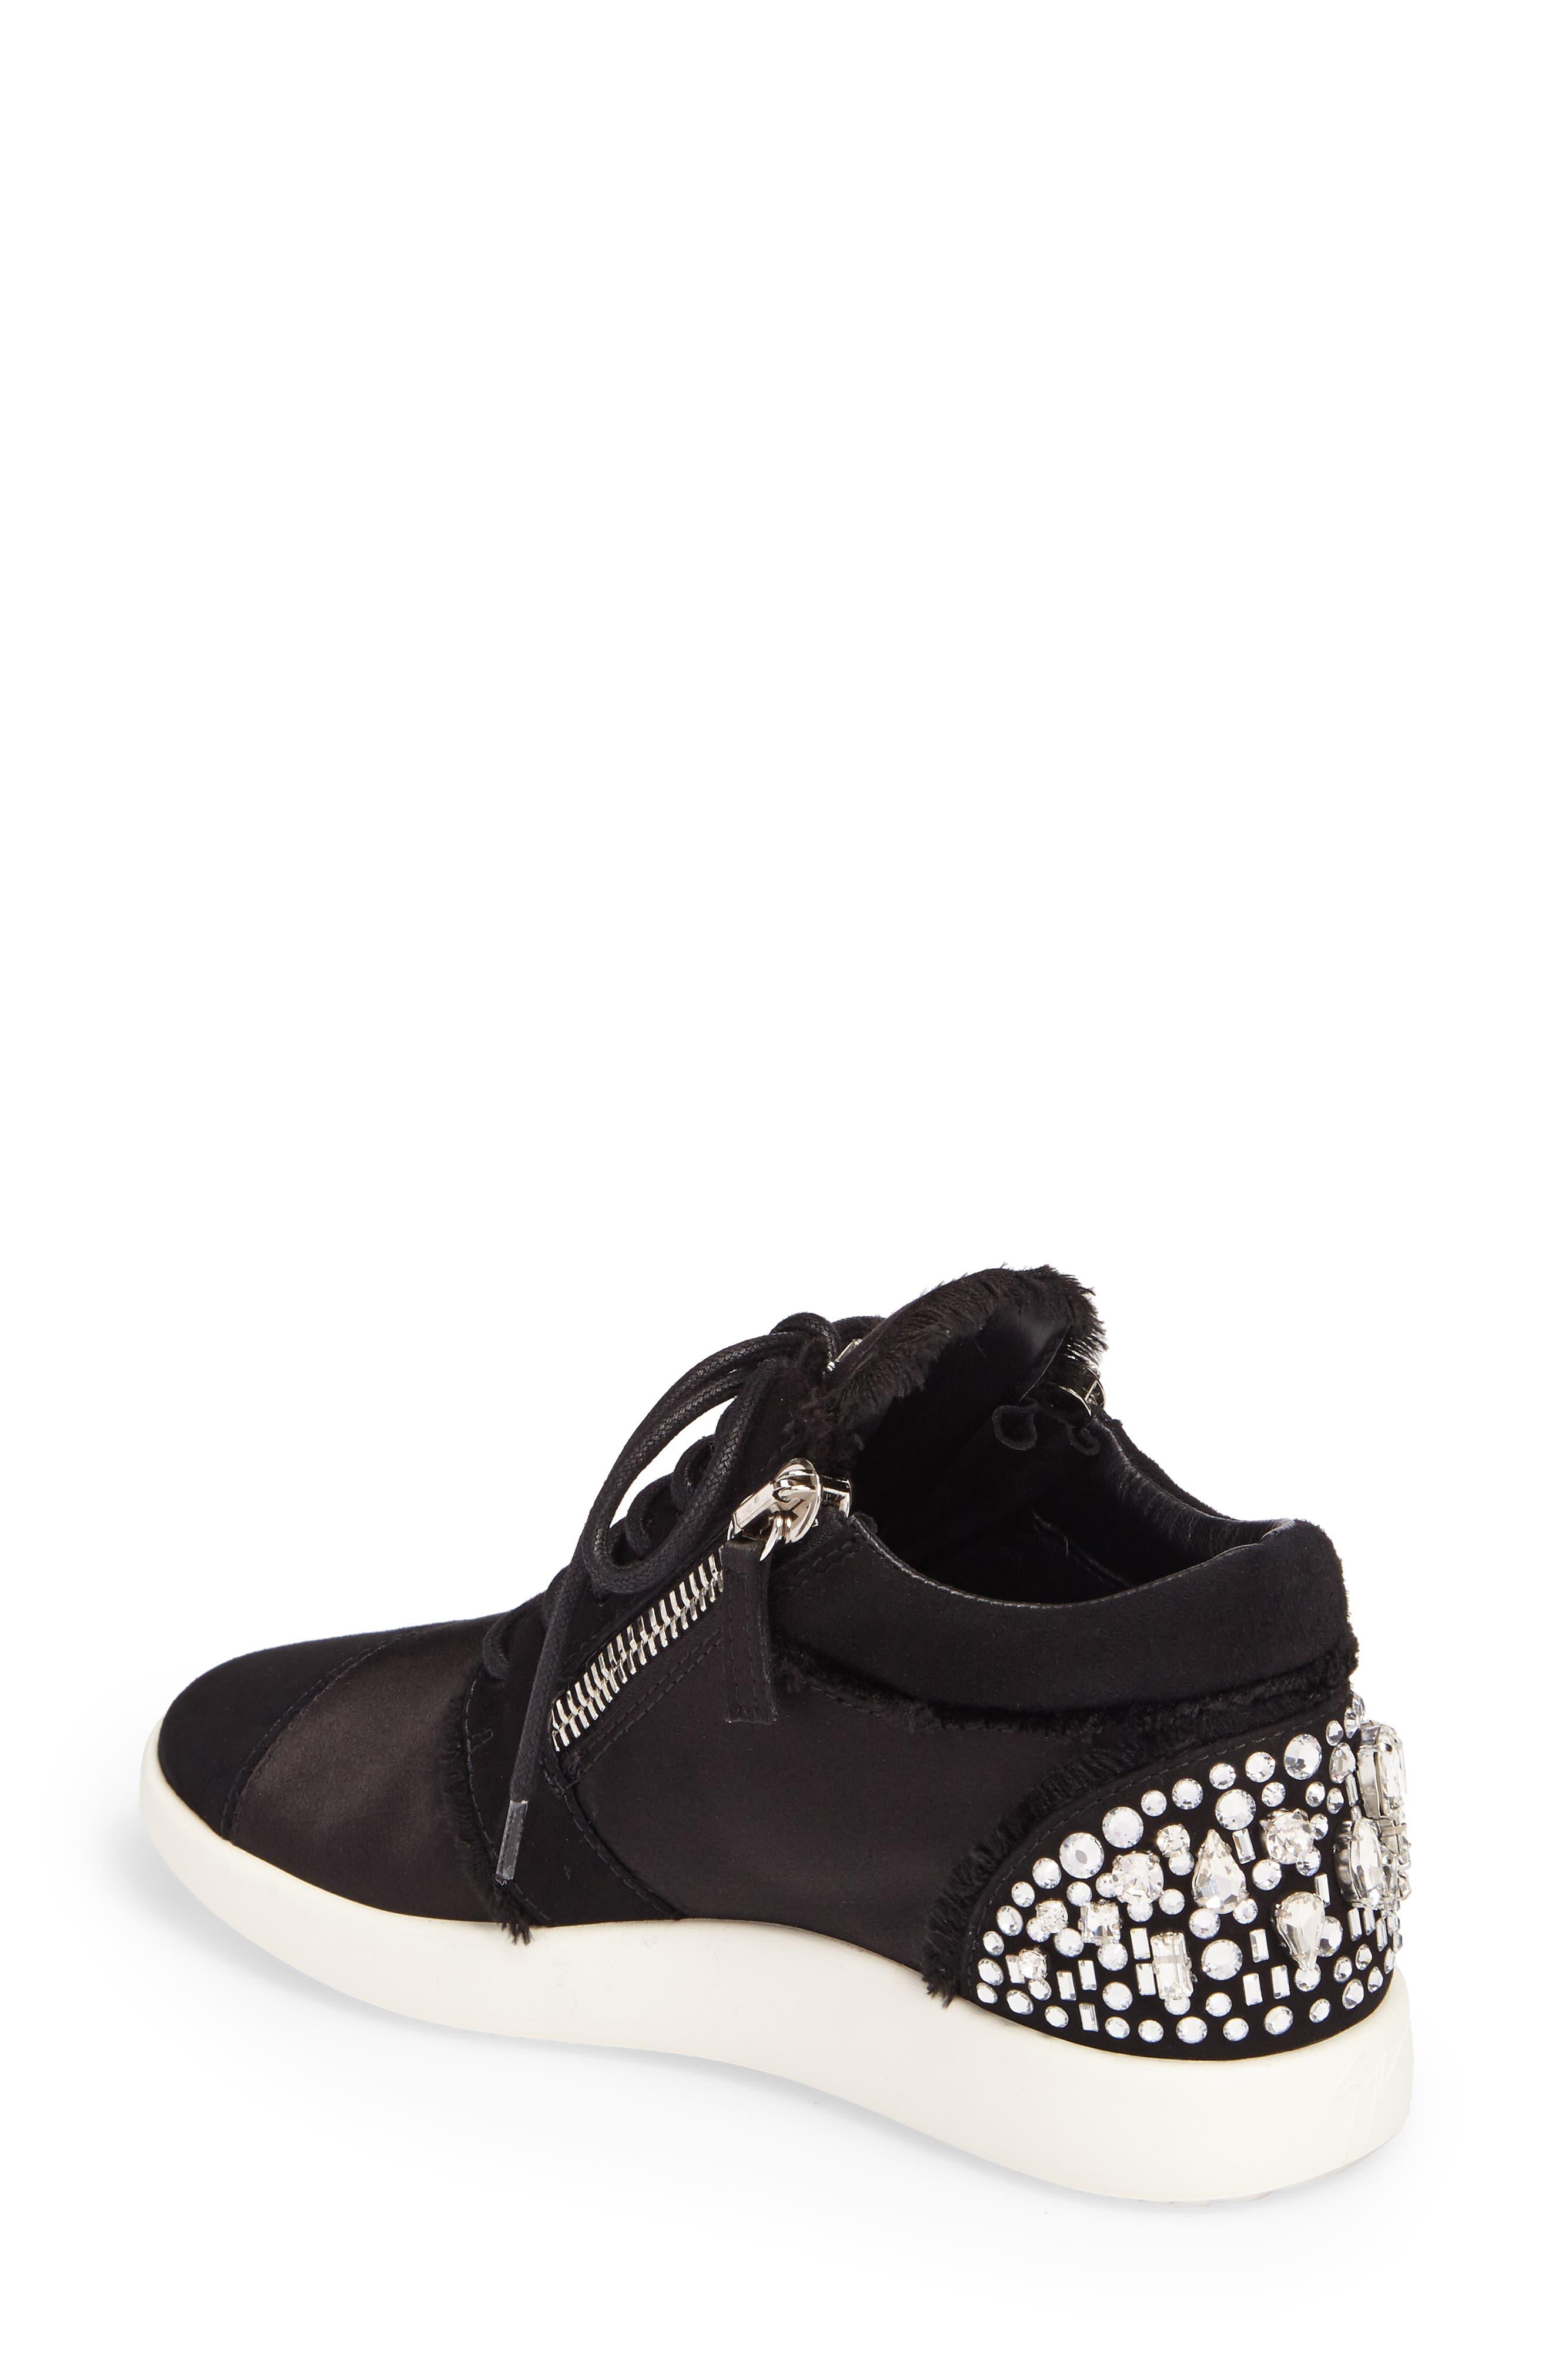 Alternate Image 2  - Giuseppe Zanotti Swarovski Crystal Embellished Sneaker (Women)